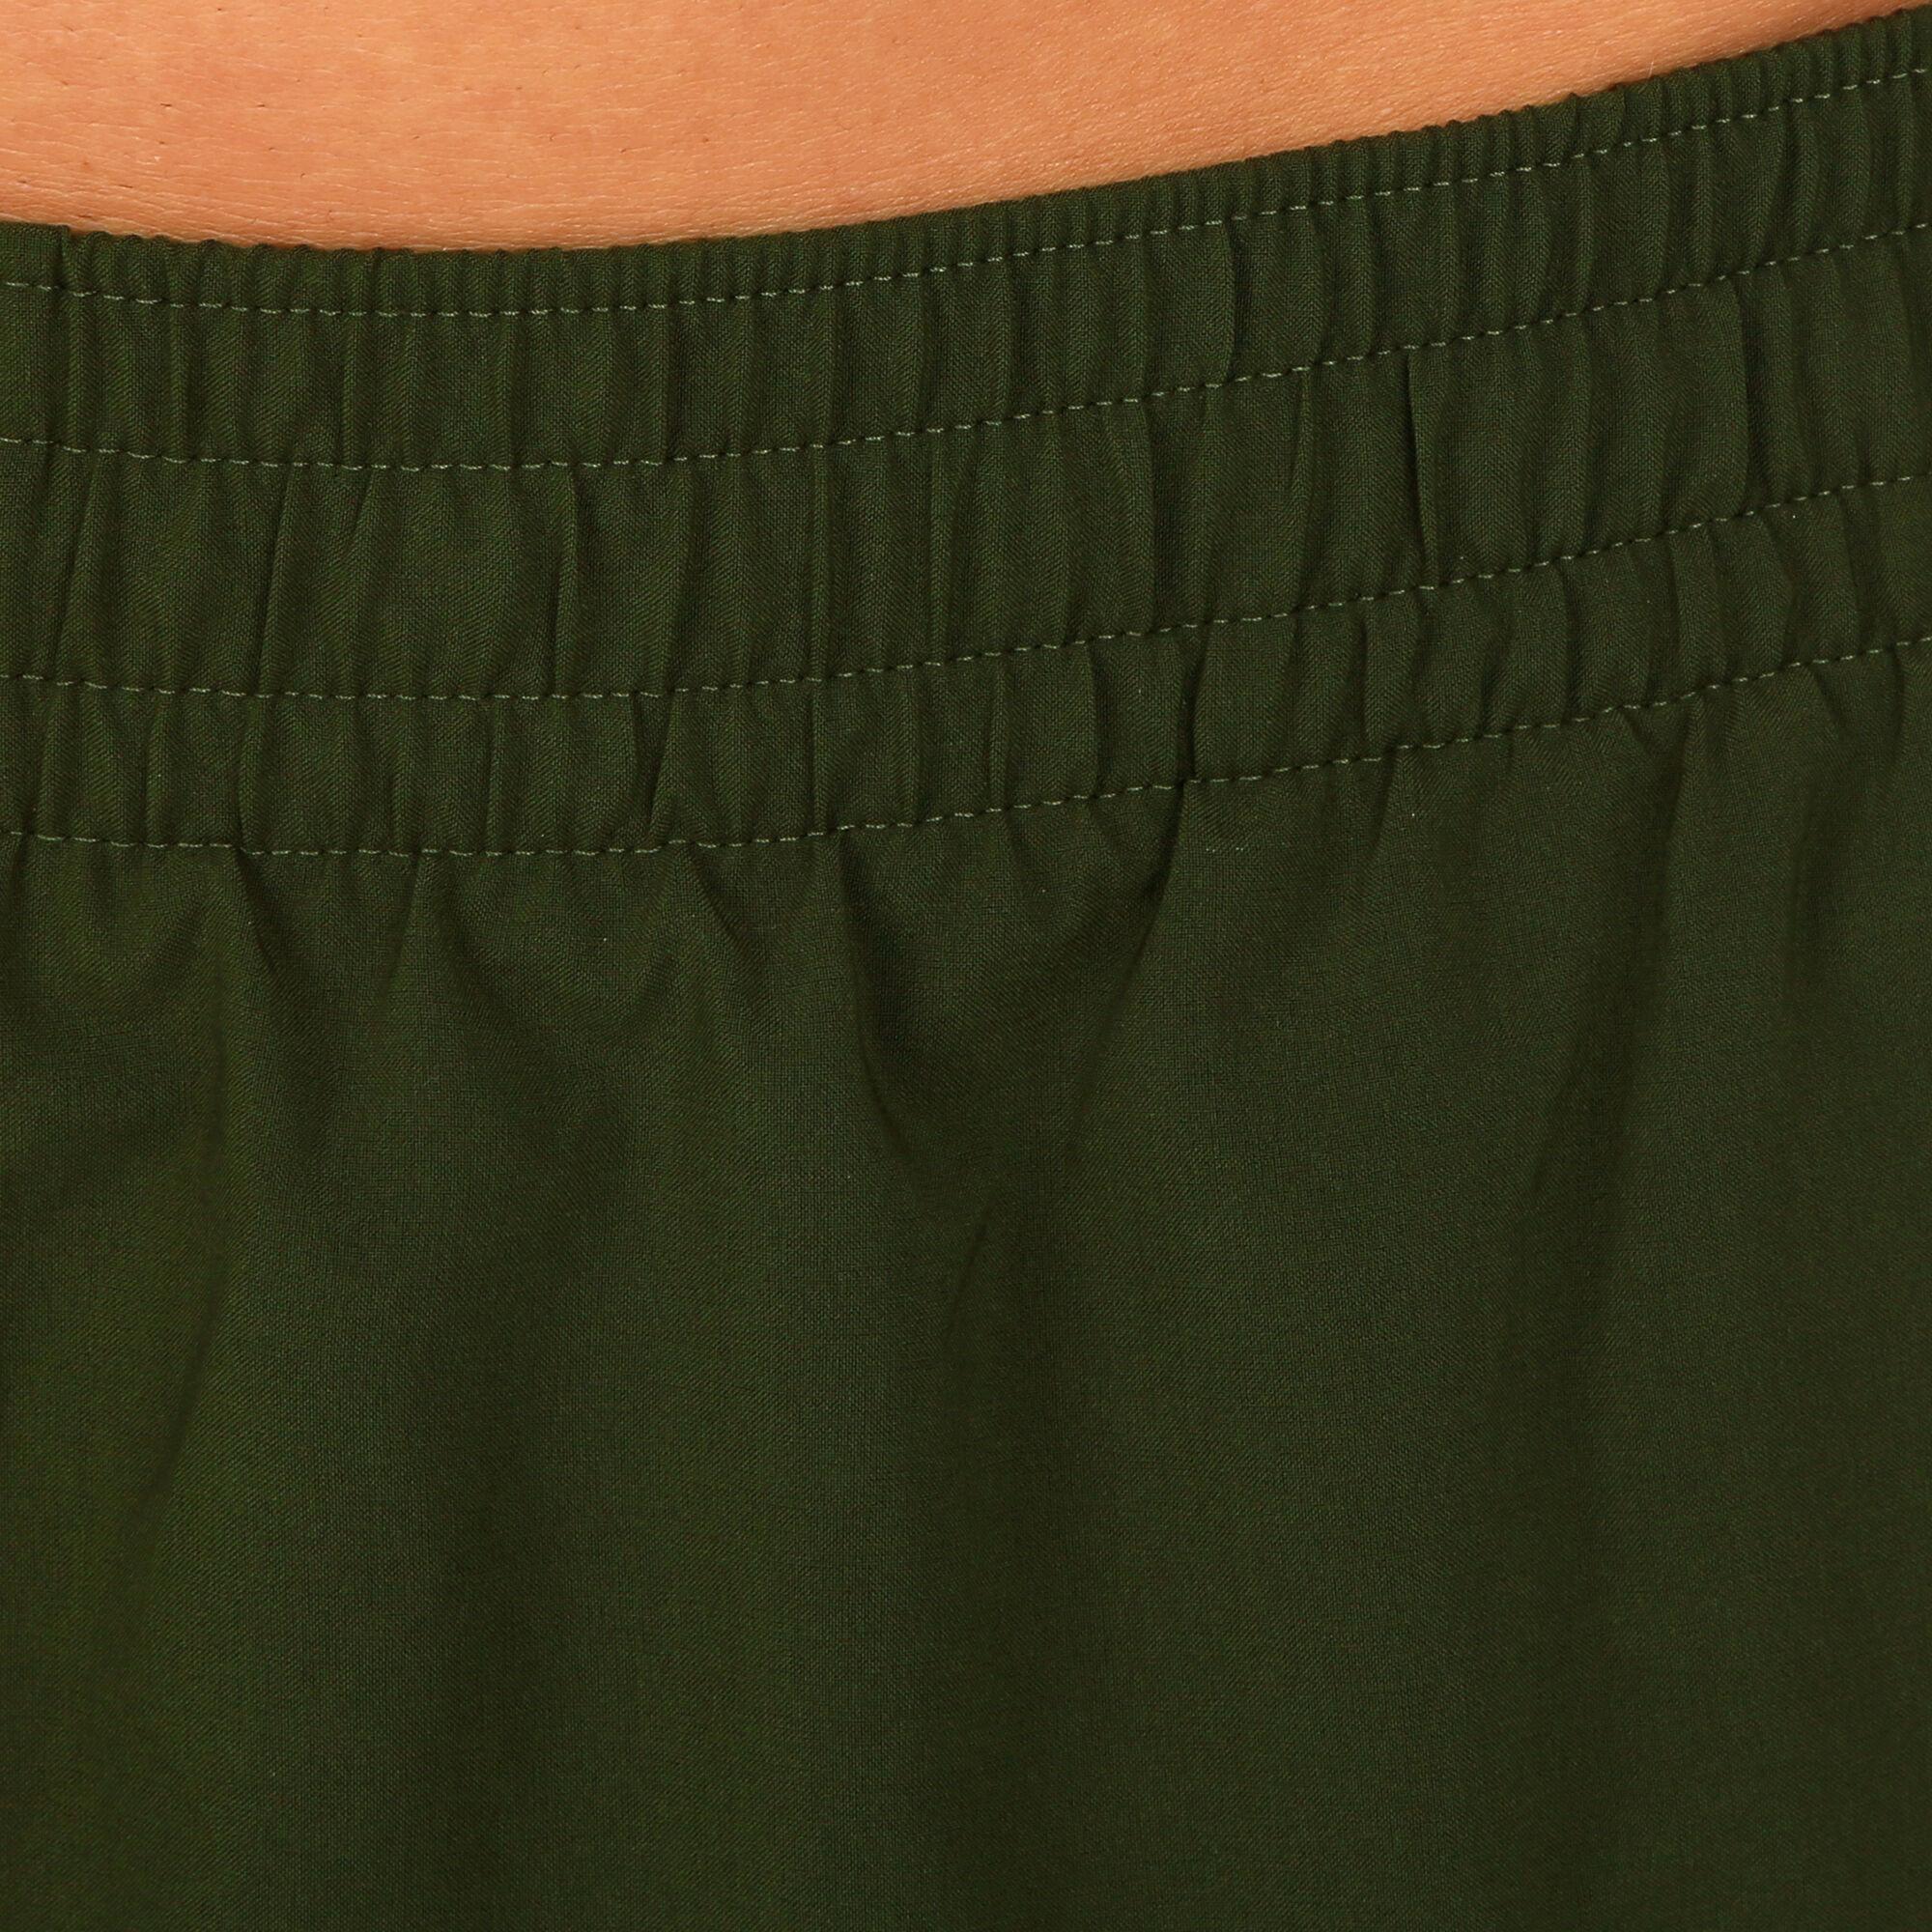 d3ed2917a3 buy Puma A.C.E. Woven 2in1 Shorts Men - Khaki, Black online ...